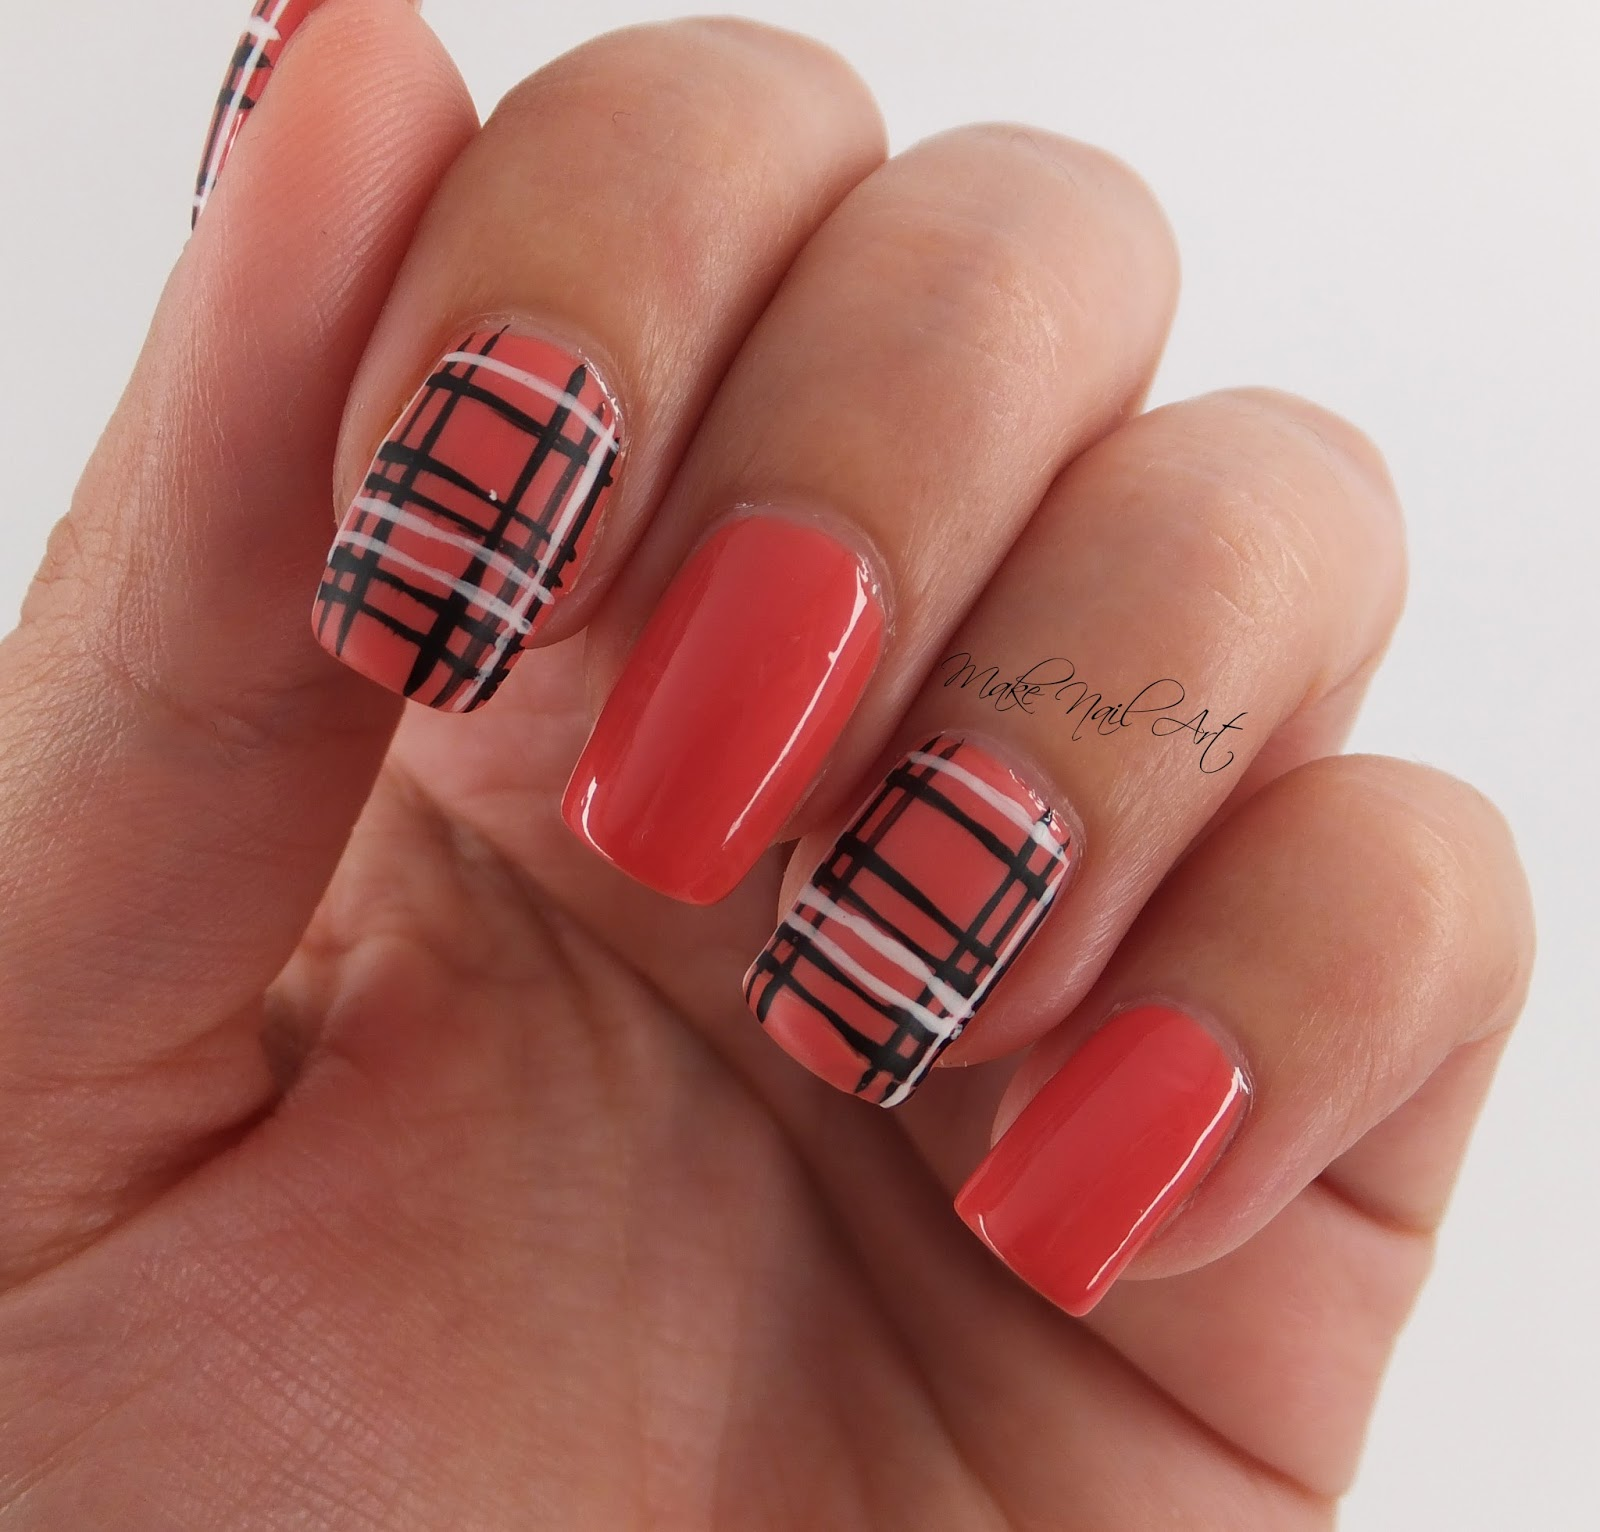 Make Nail Art: Easy Autumn Plaid Nails Nail Art Design Tutorial